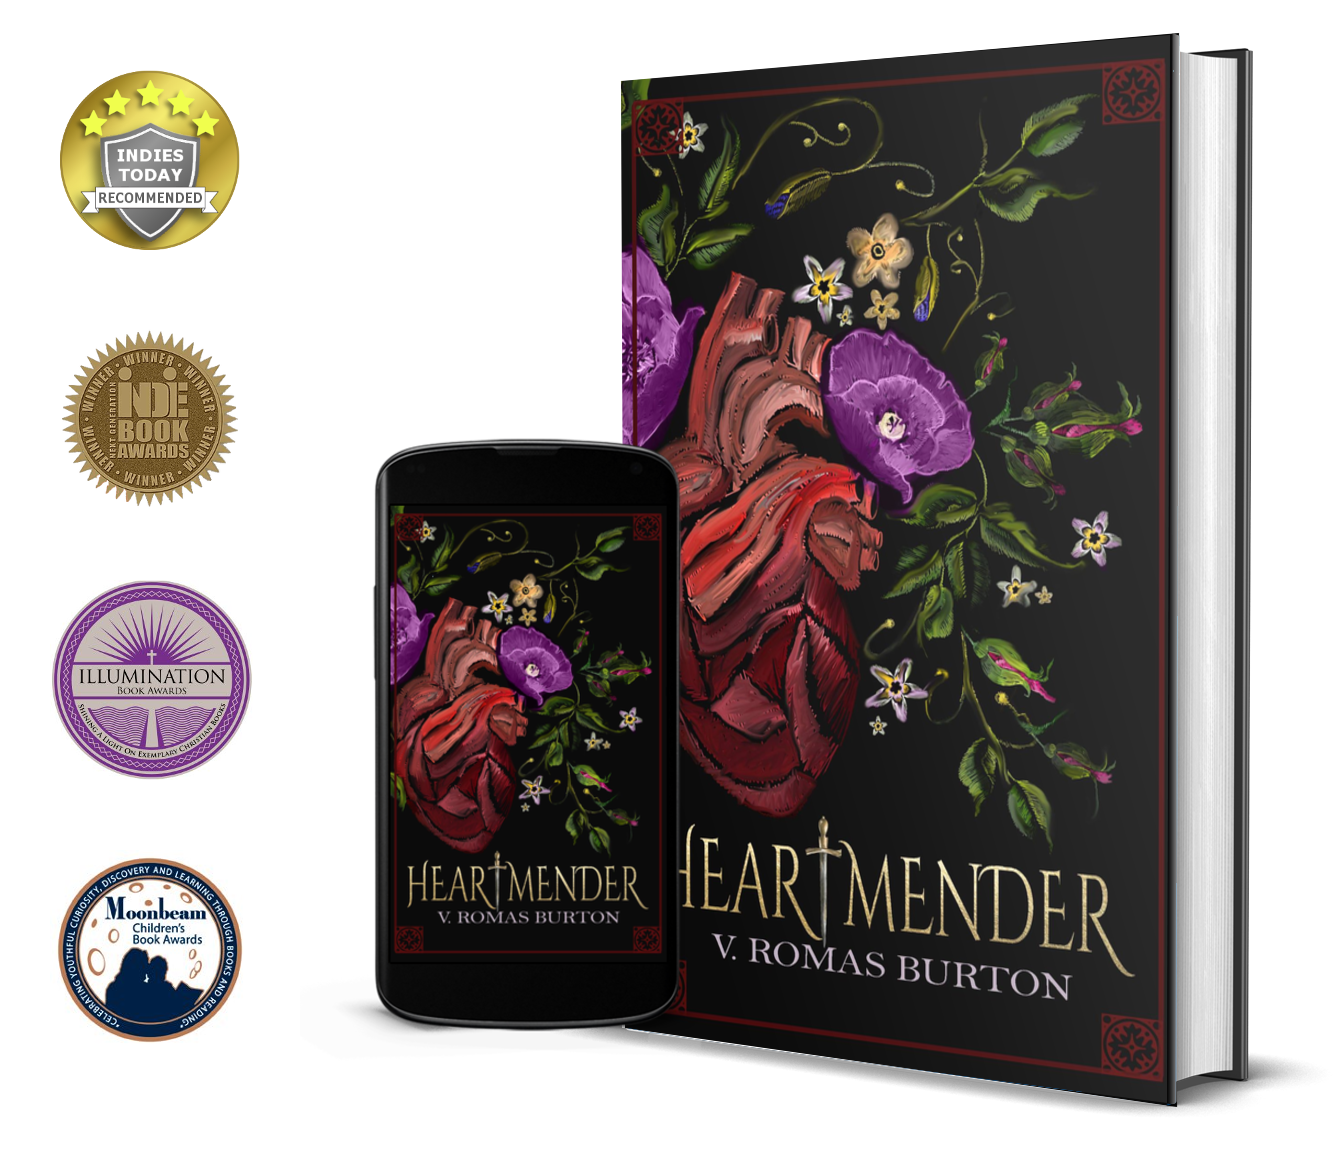 Heartmender badges, Indies Today Recommends, Indie Book Award, Moonbeam Children's Book Award, Illumination Book Award